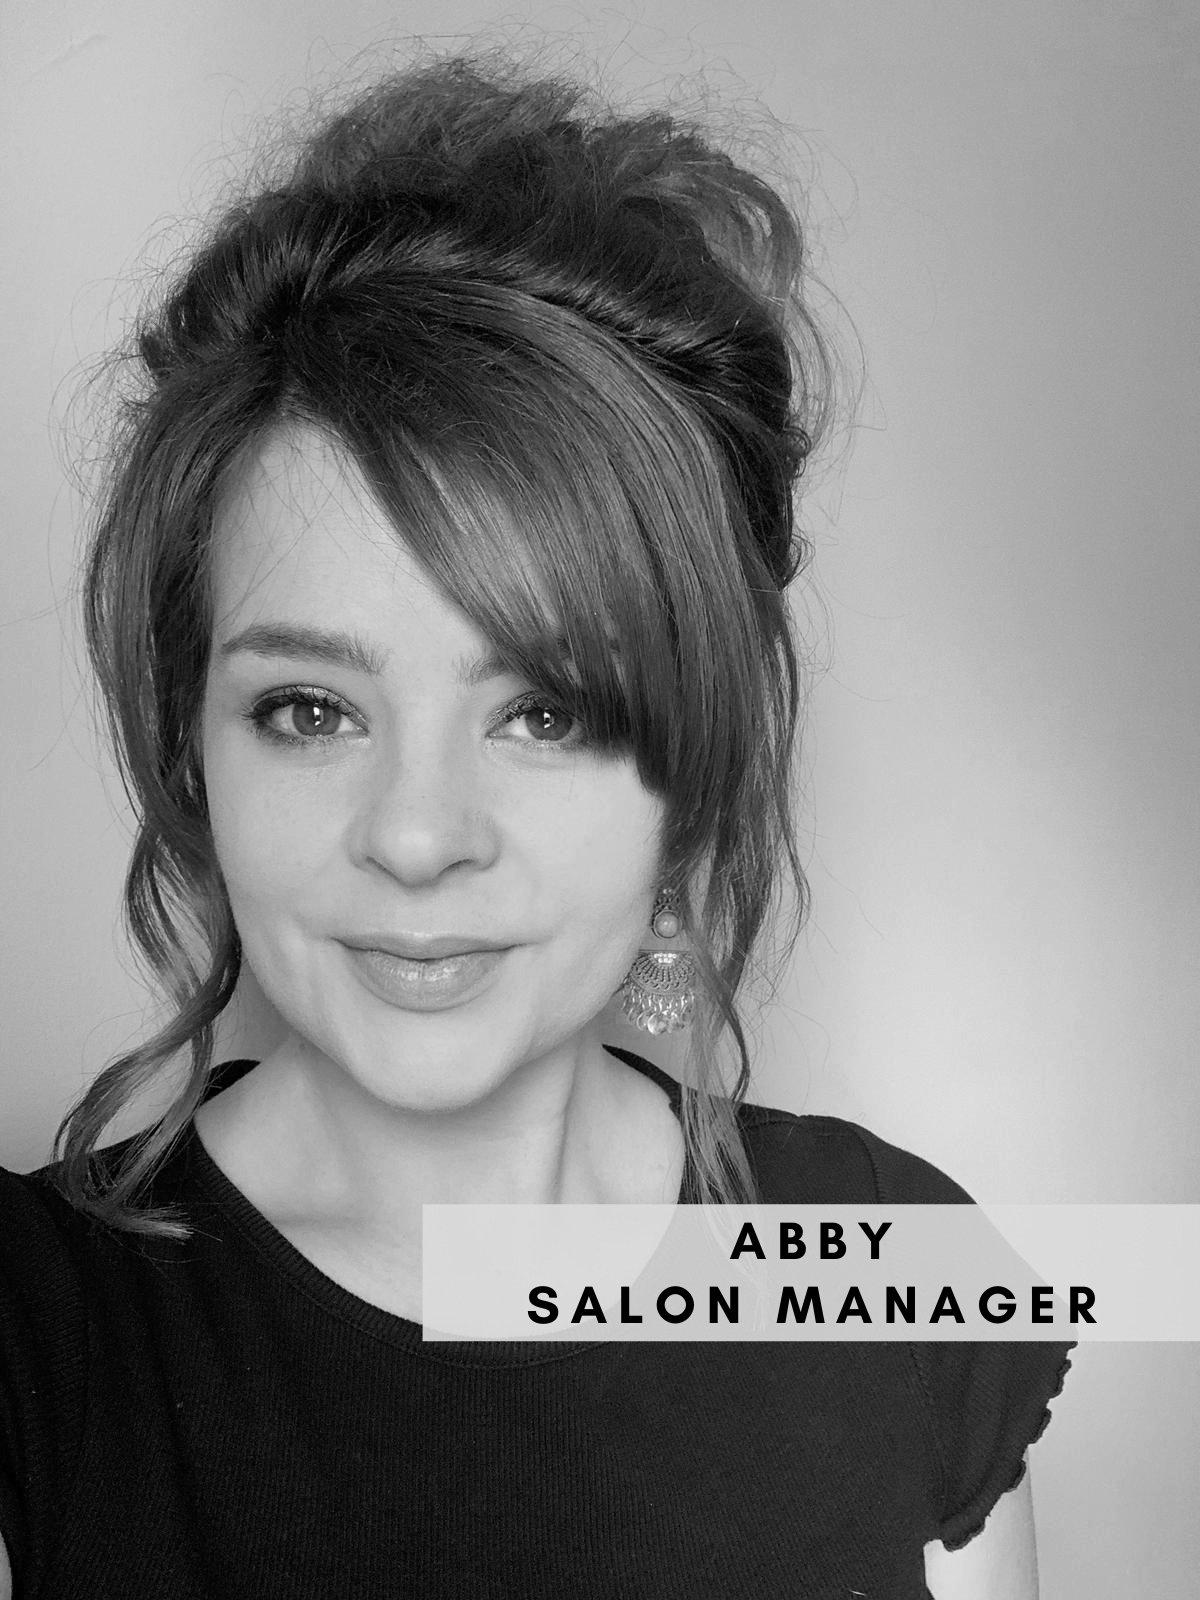 Abby – Salon Manager